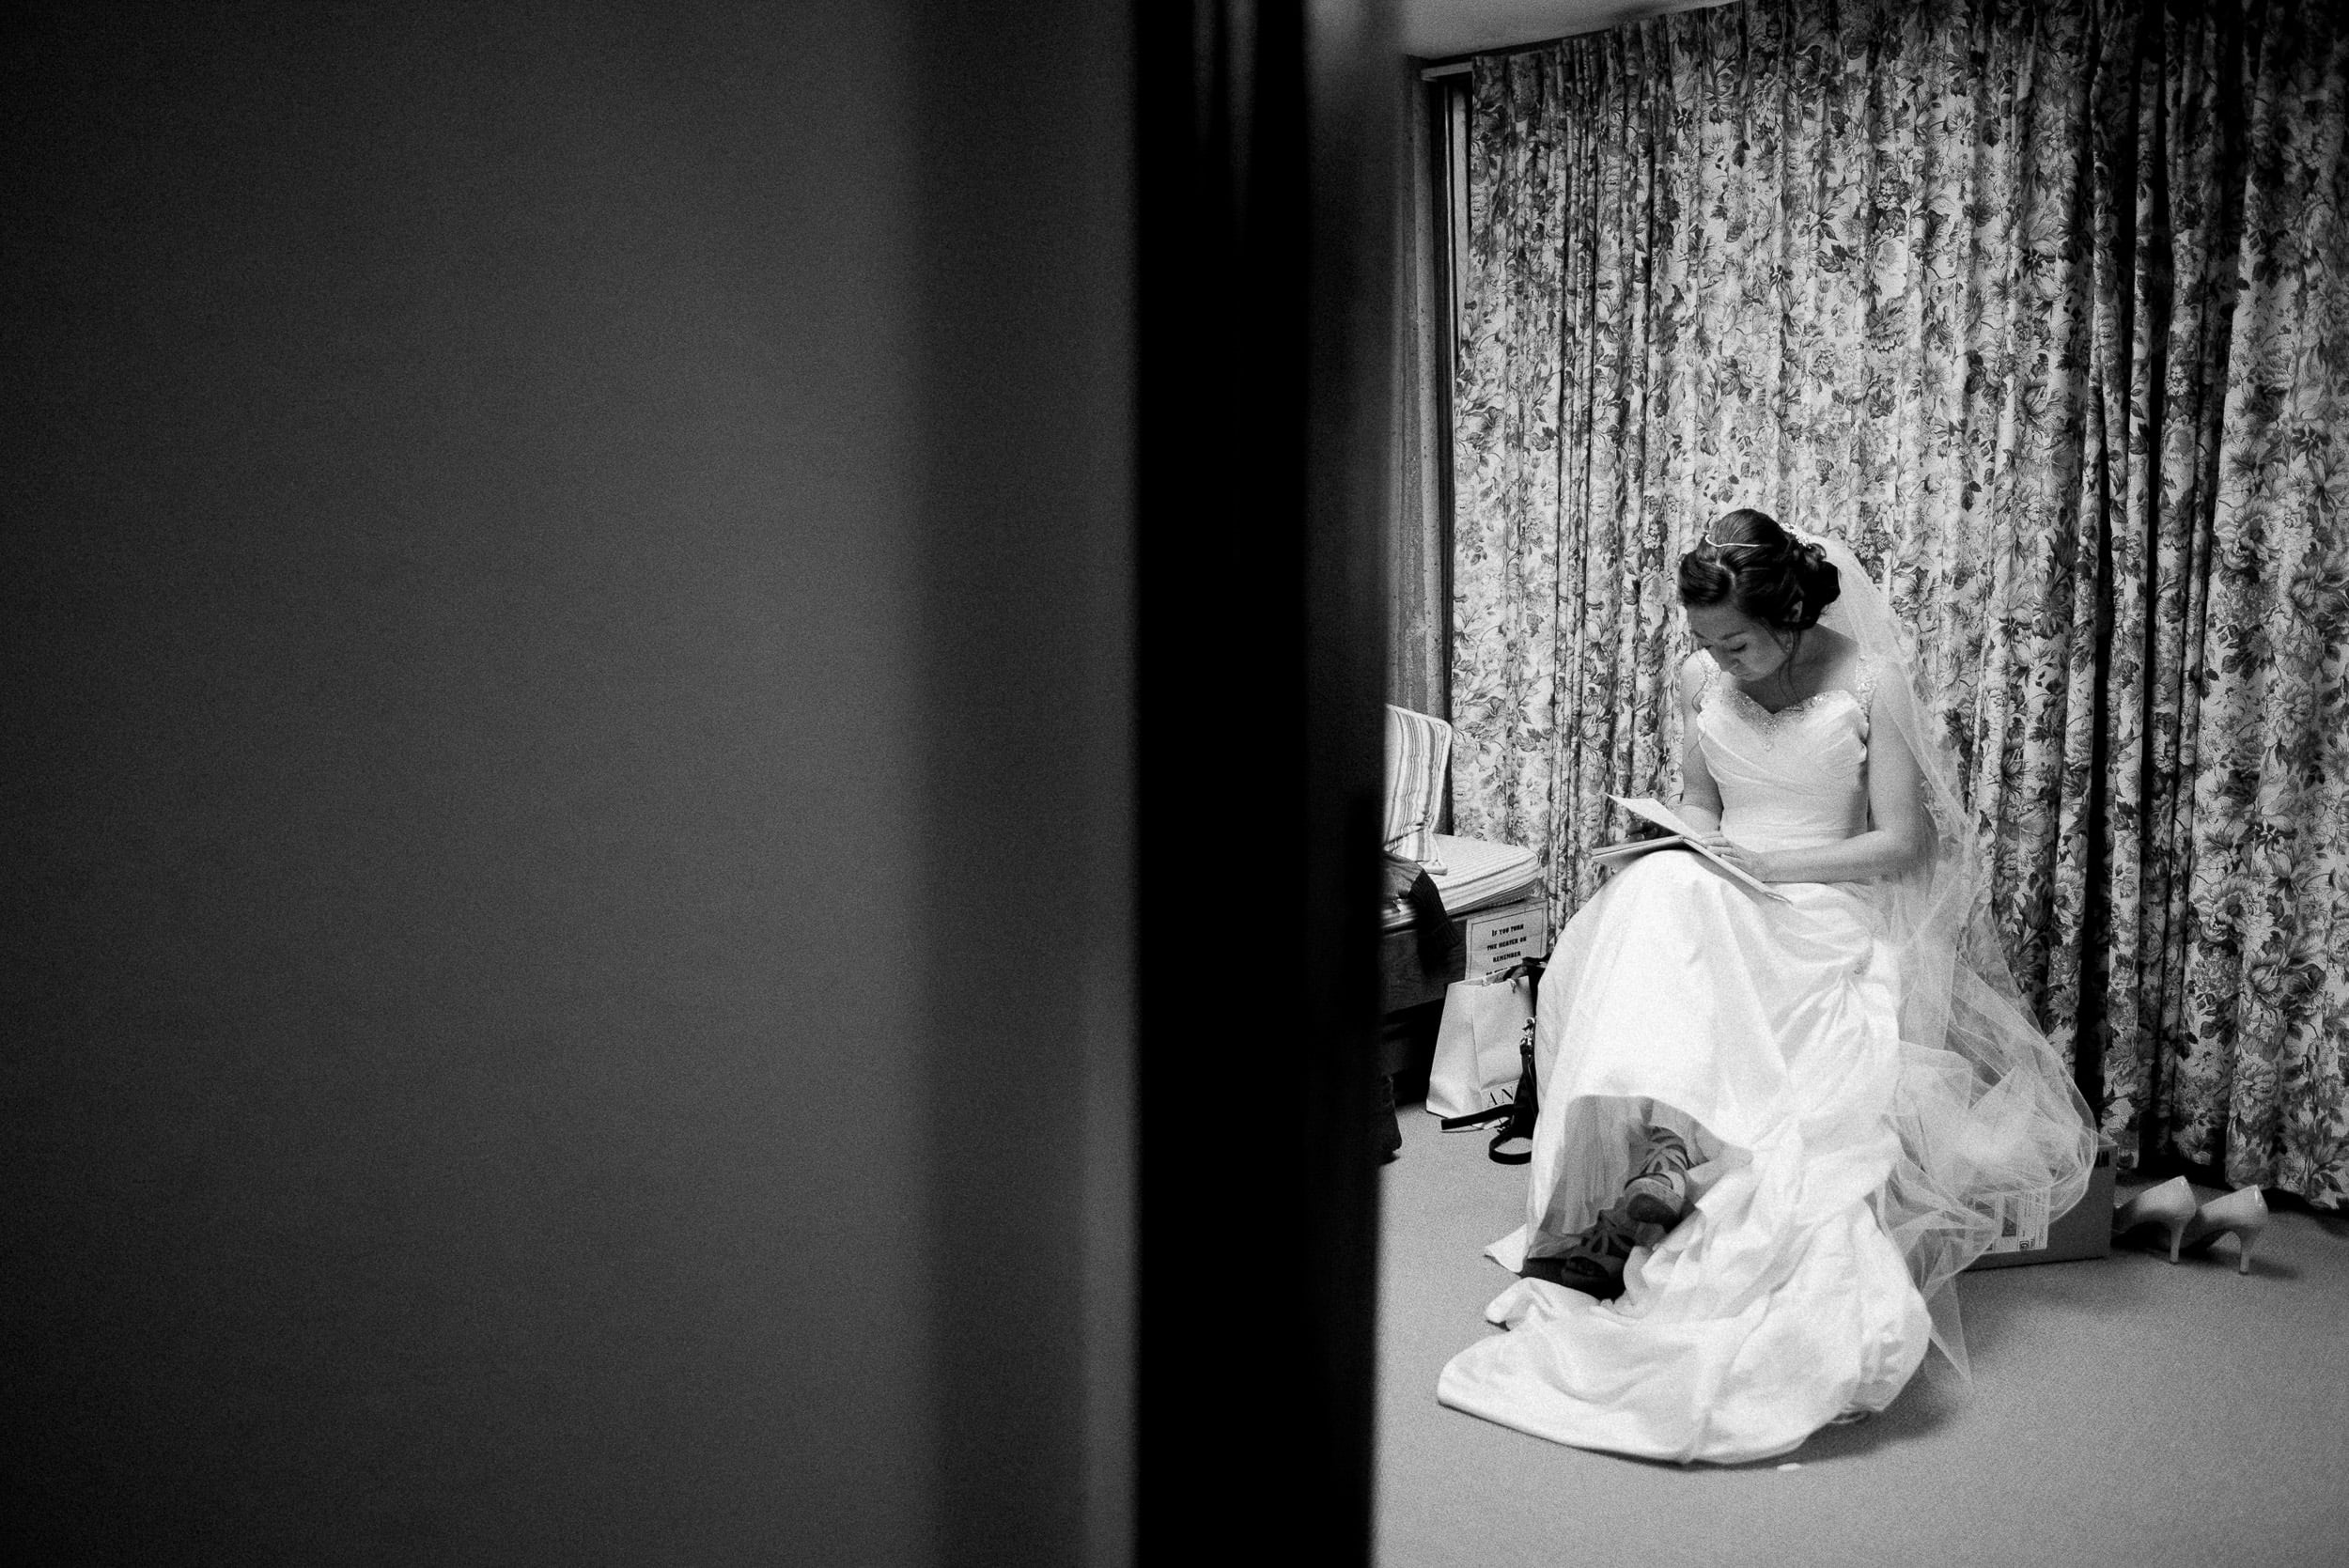 Moraga Valley Church wedding 023.jpg